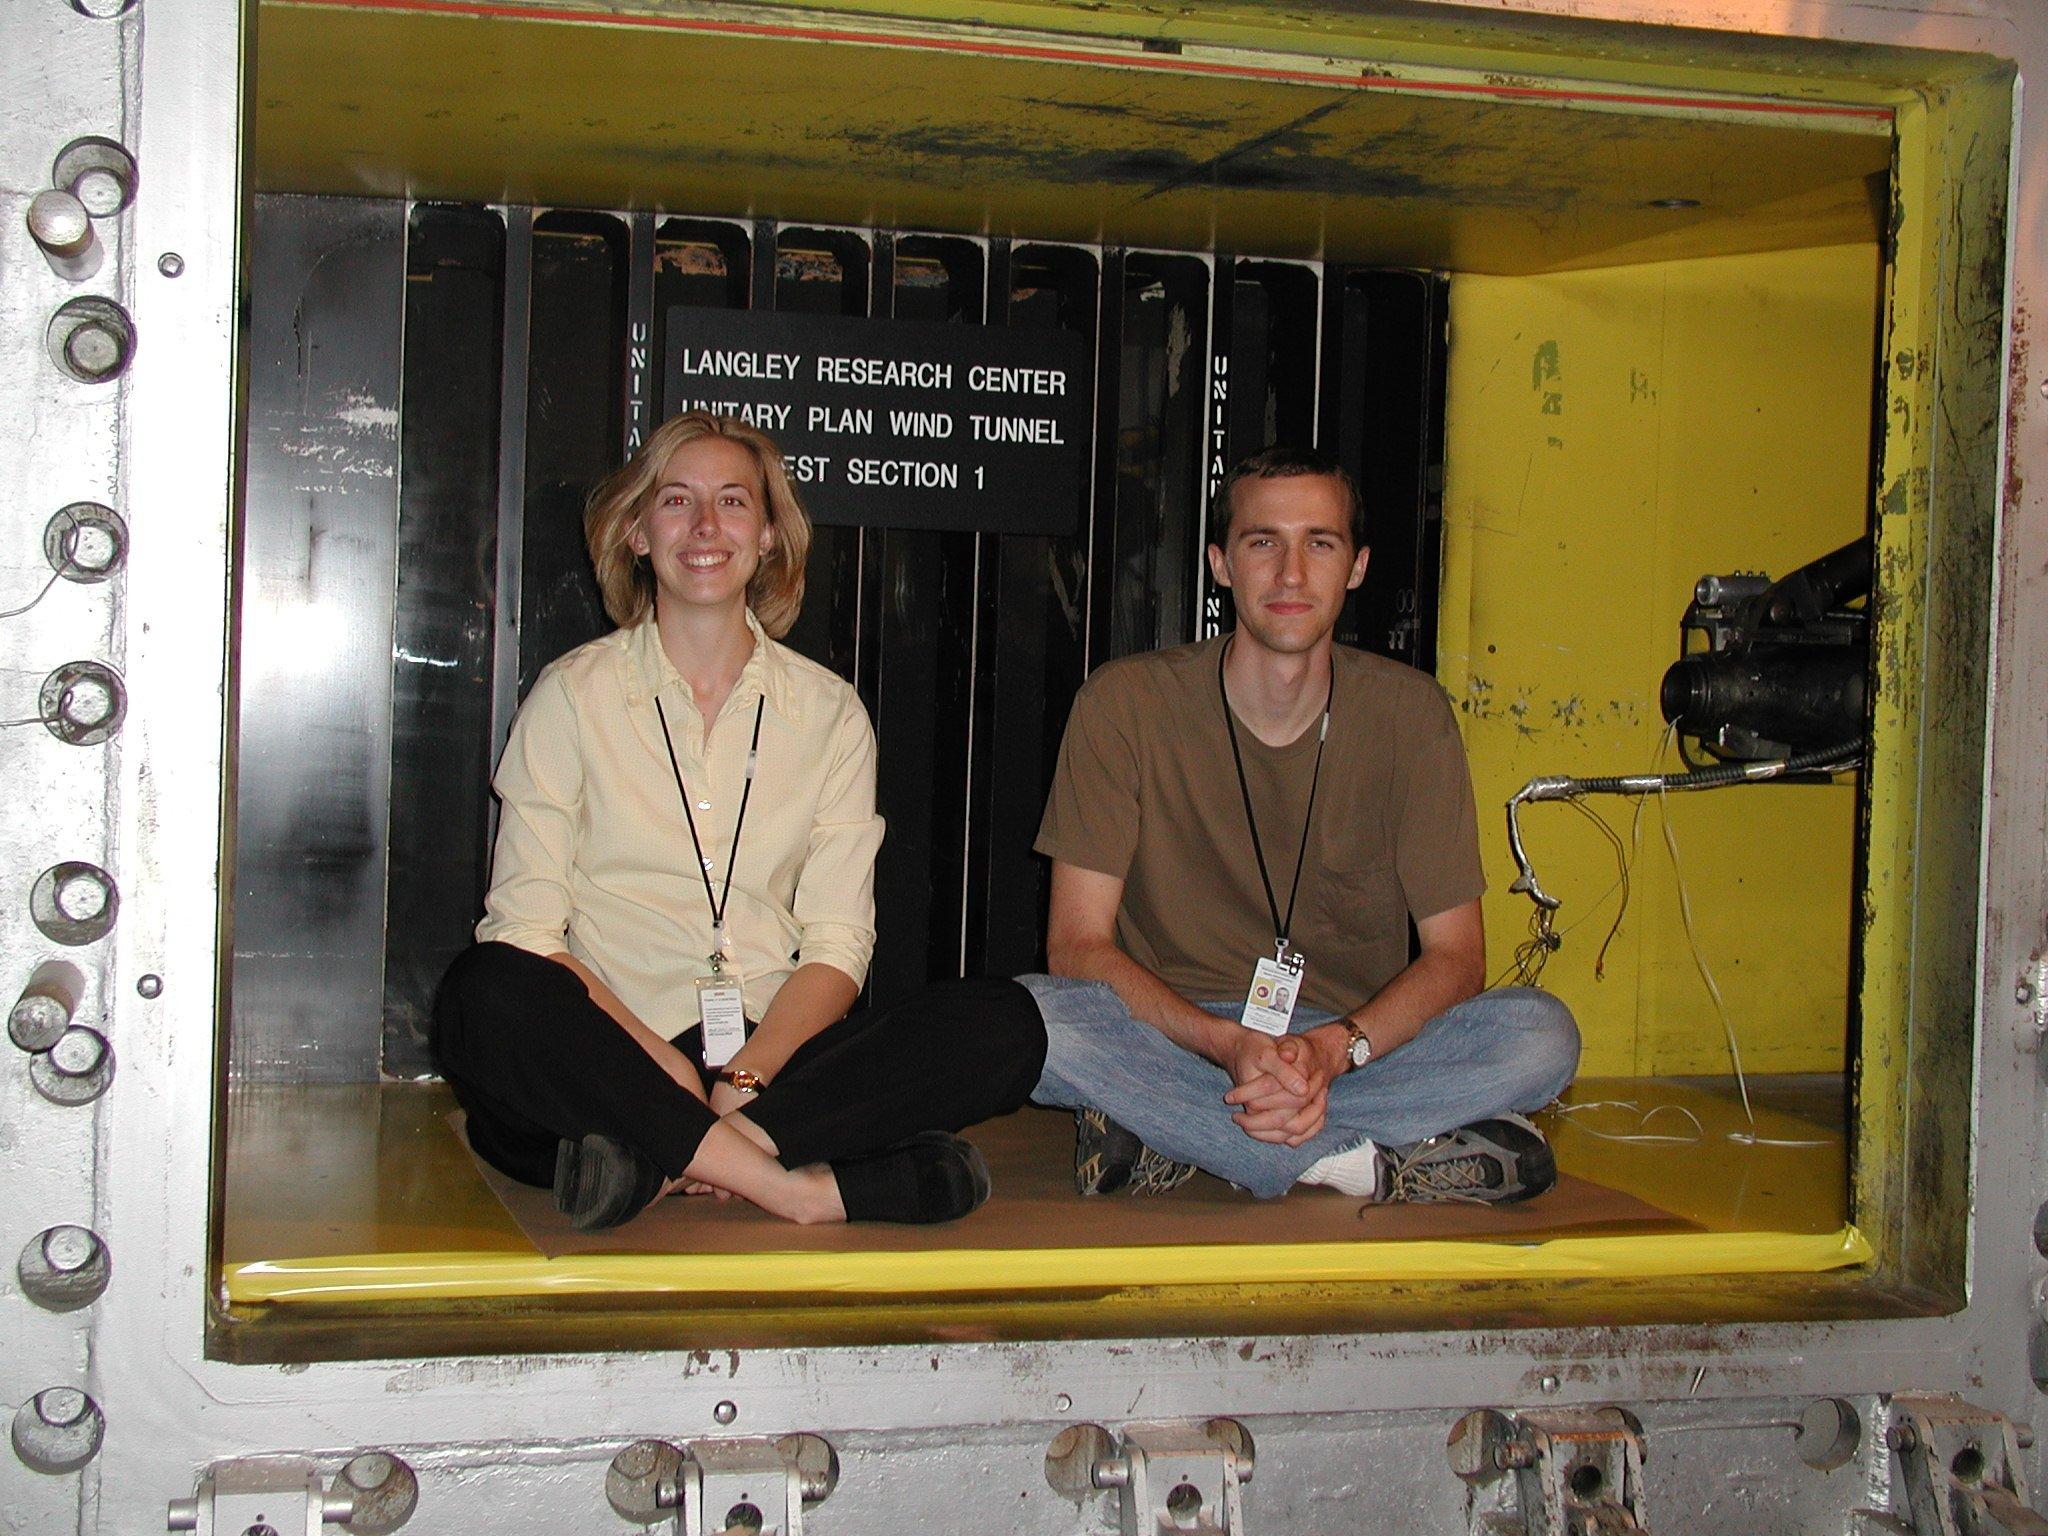 NASA Unitary Wind Tunnel Cross Section